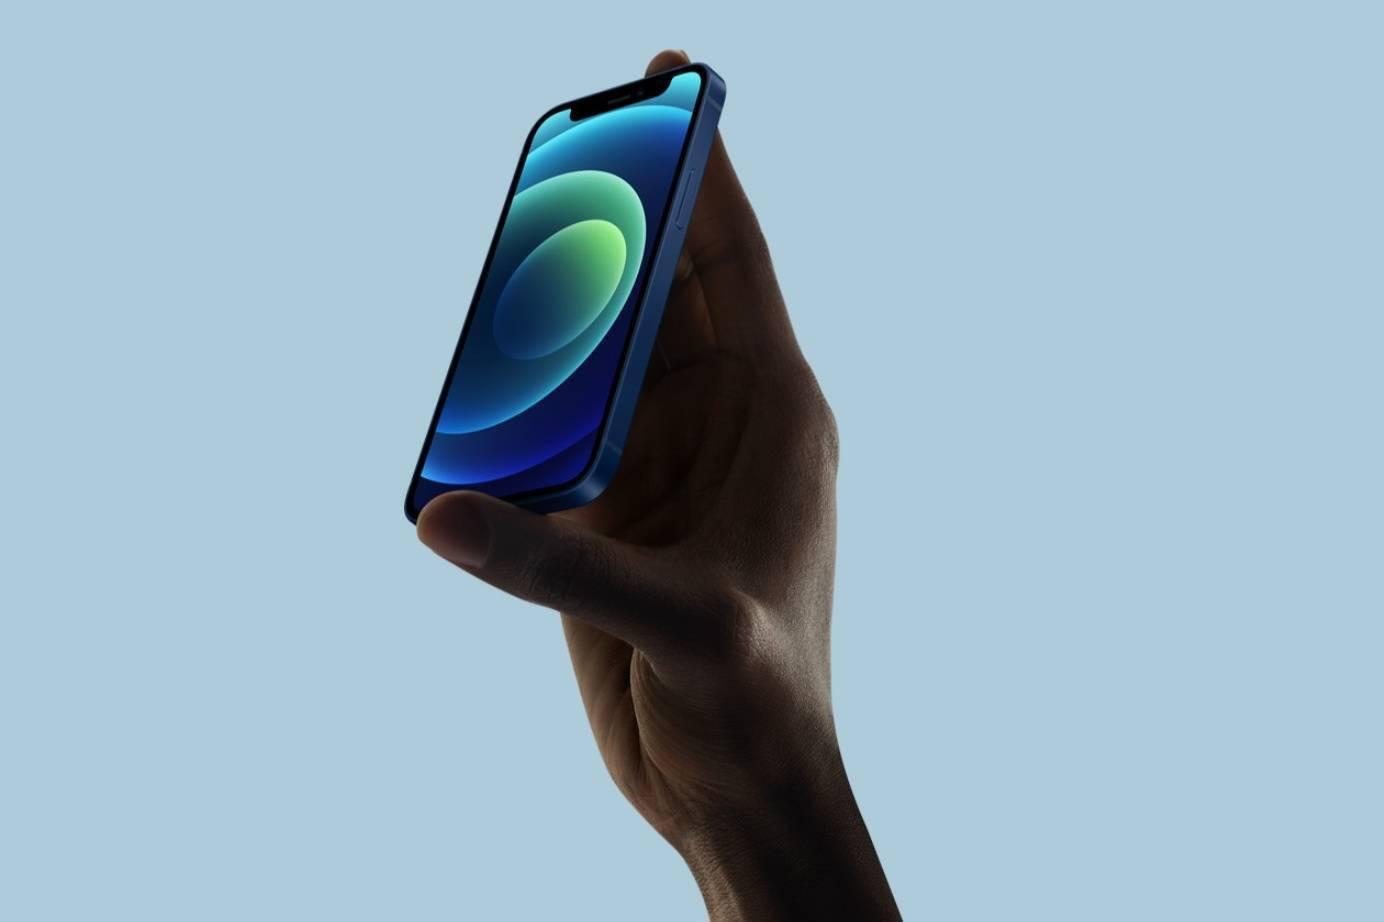 Mini|苹果客服回应iPhone 12 Mini停产:尚未收到通知